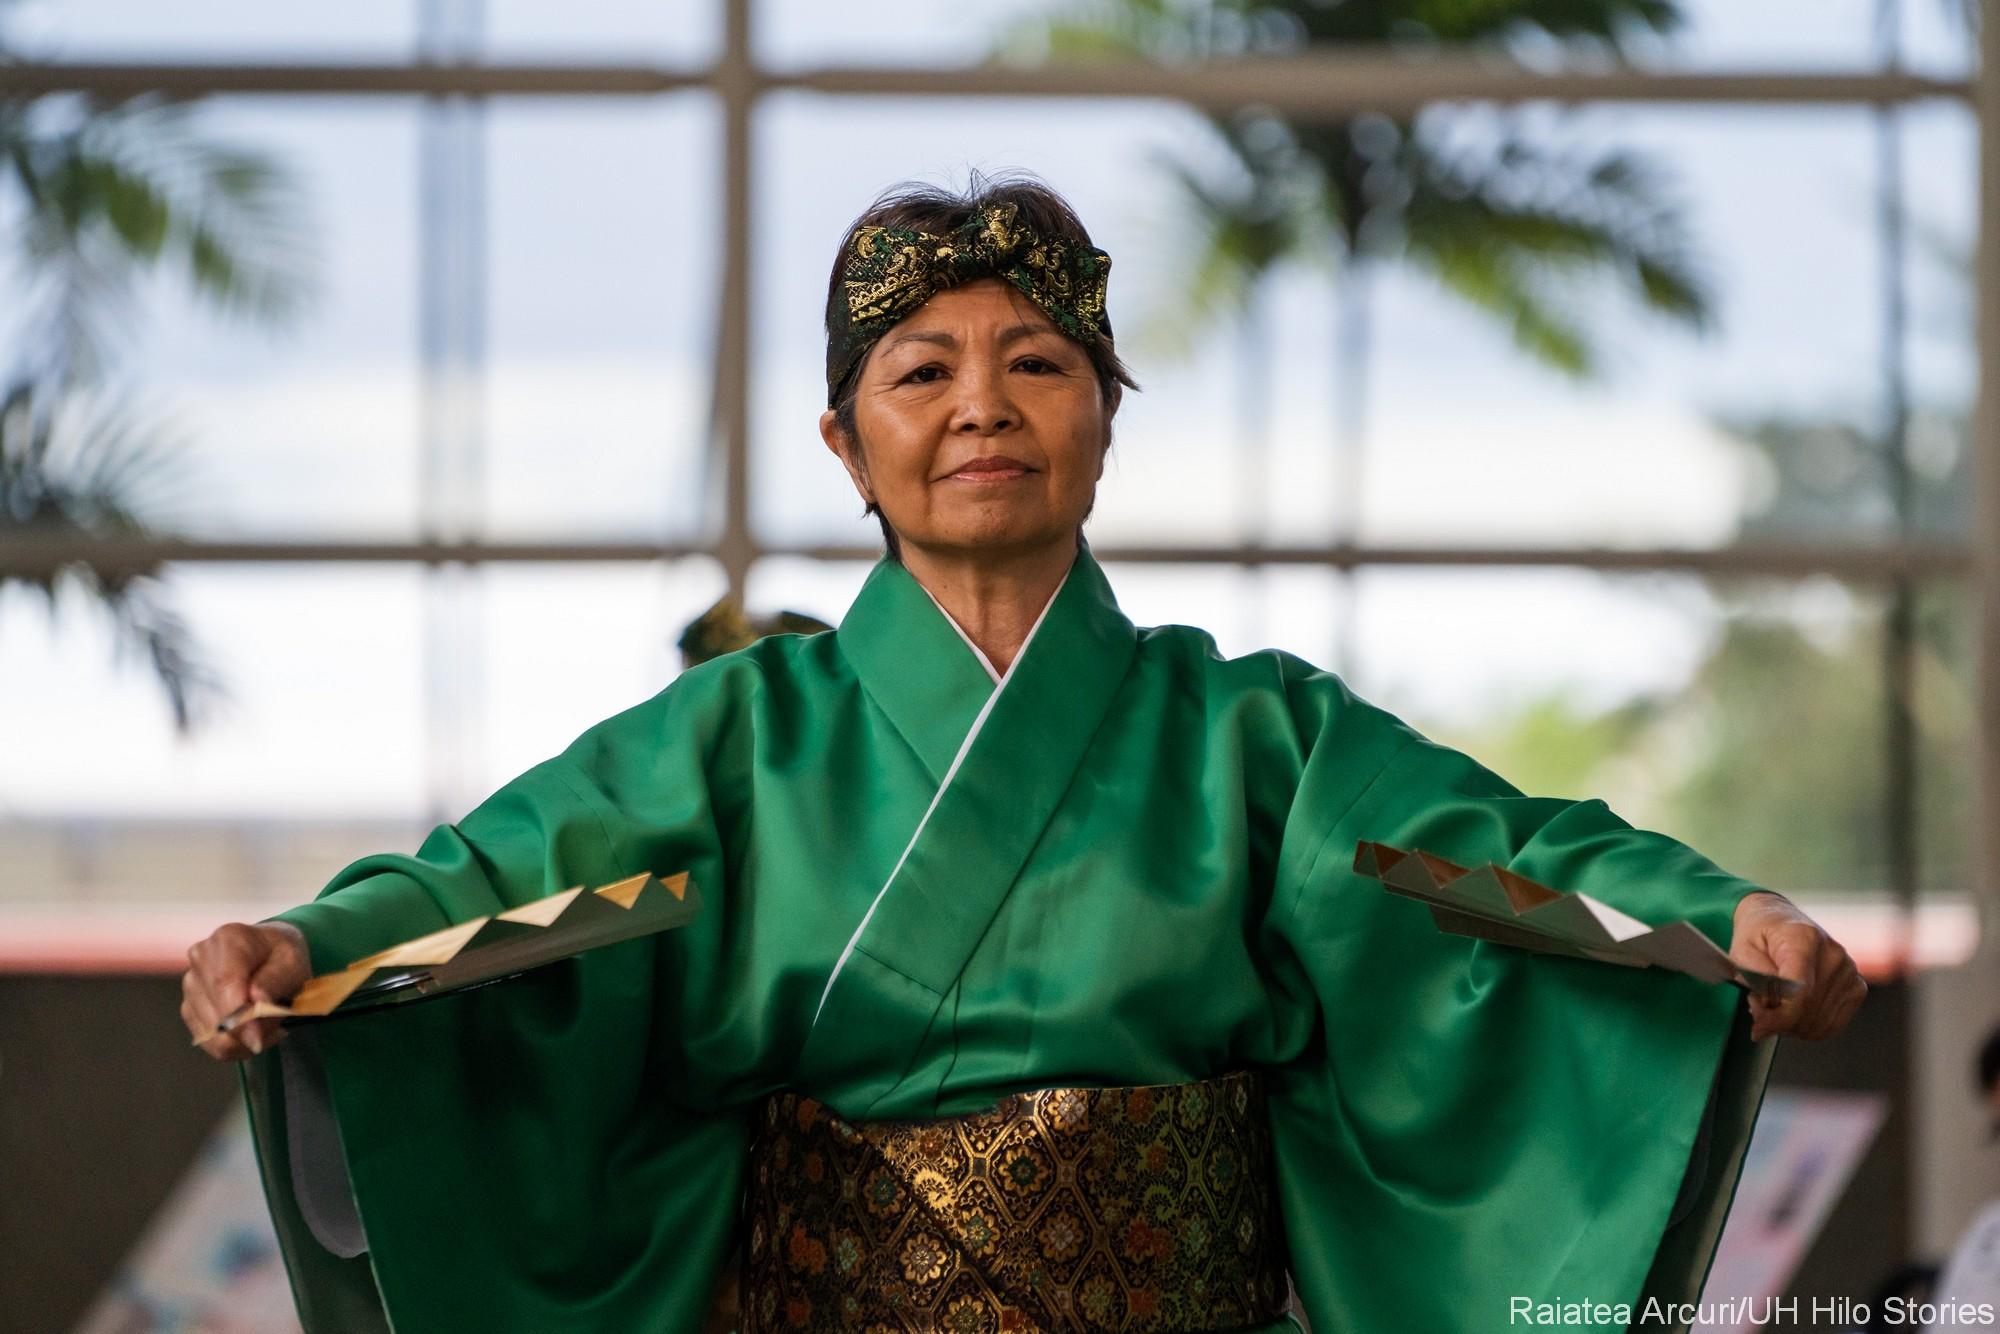 Woman in green doing Okinawan Dance.